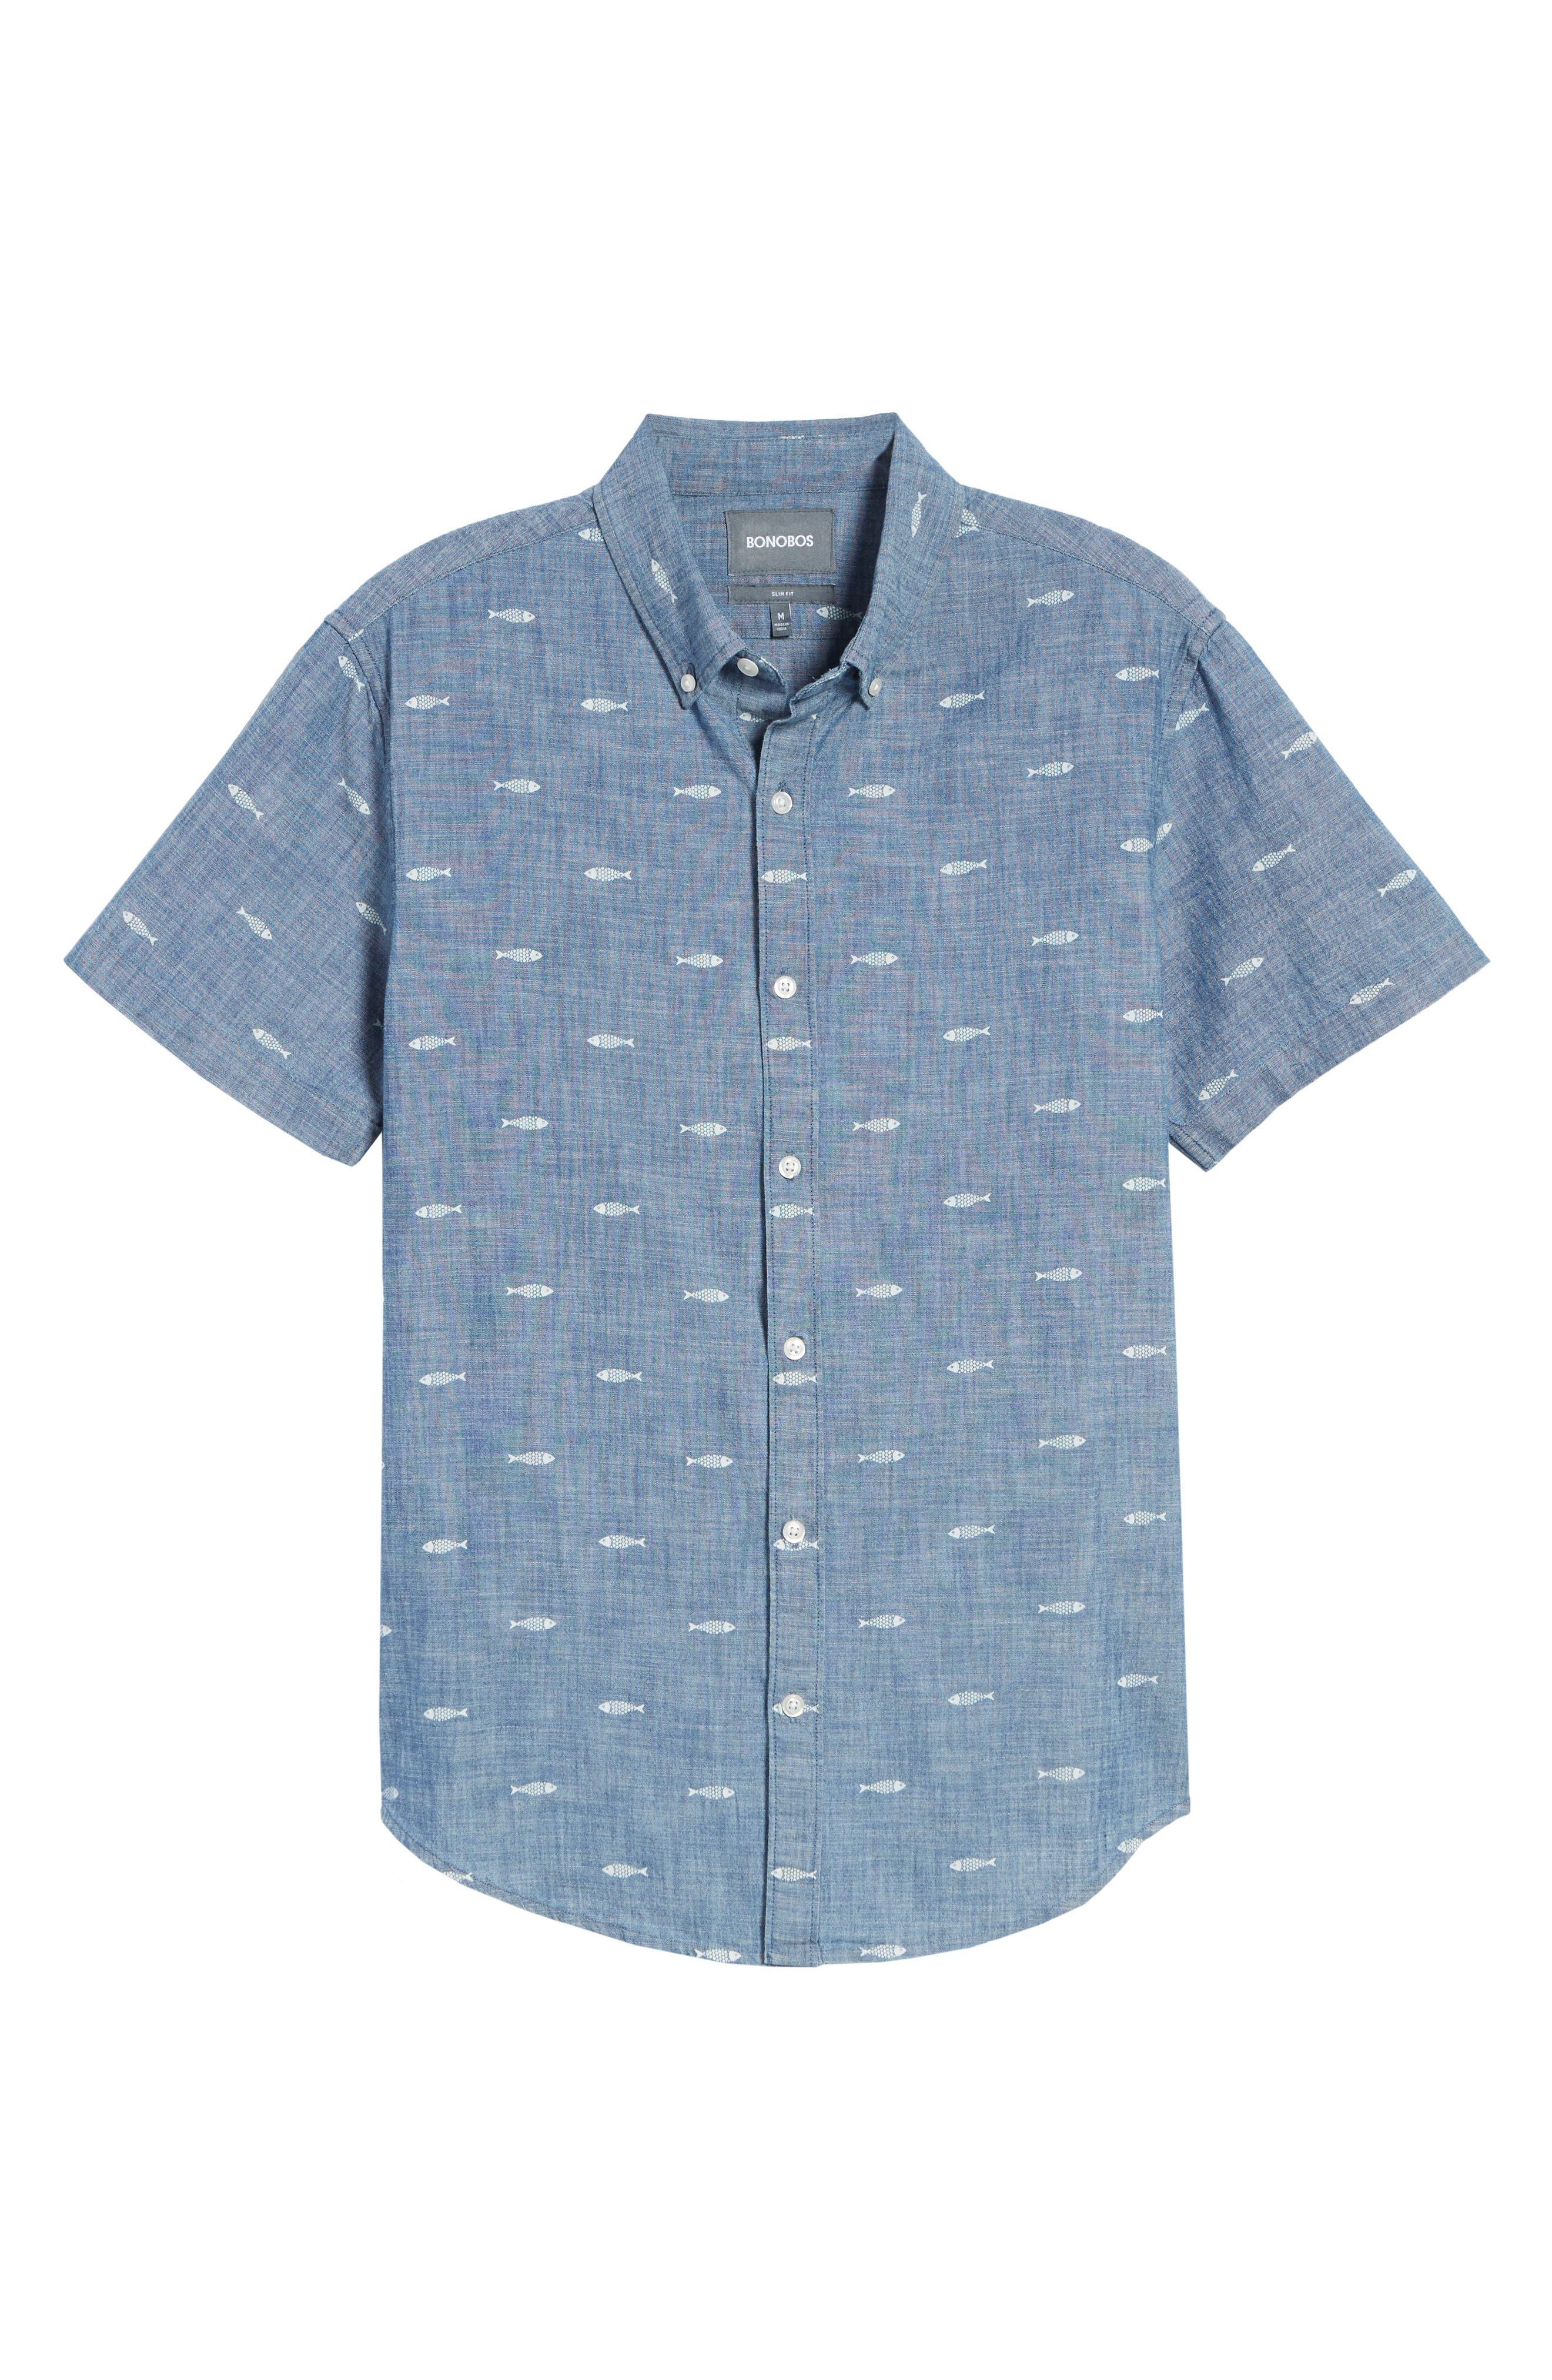 BONOBOS, Riviera Slim Fit Print Sport Shirt, Alternate thumbnail 5, color, CHAMBRAY SARDEEN SCATTER